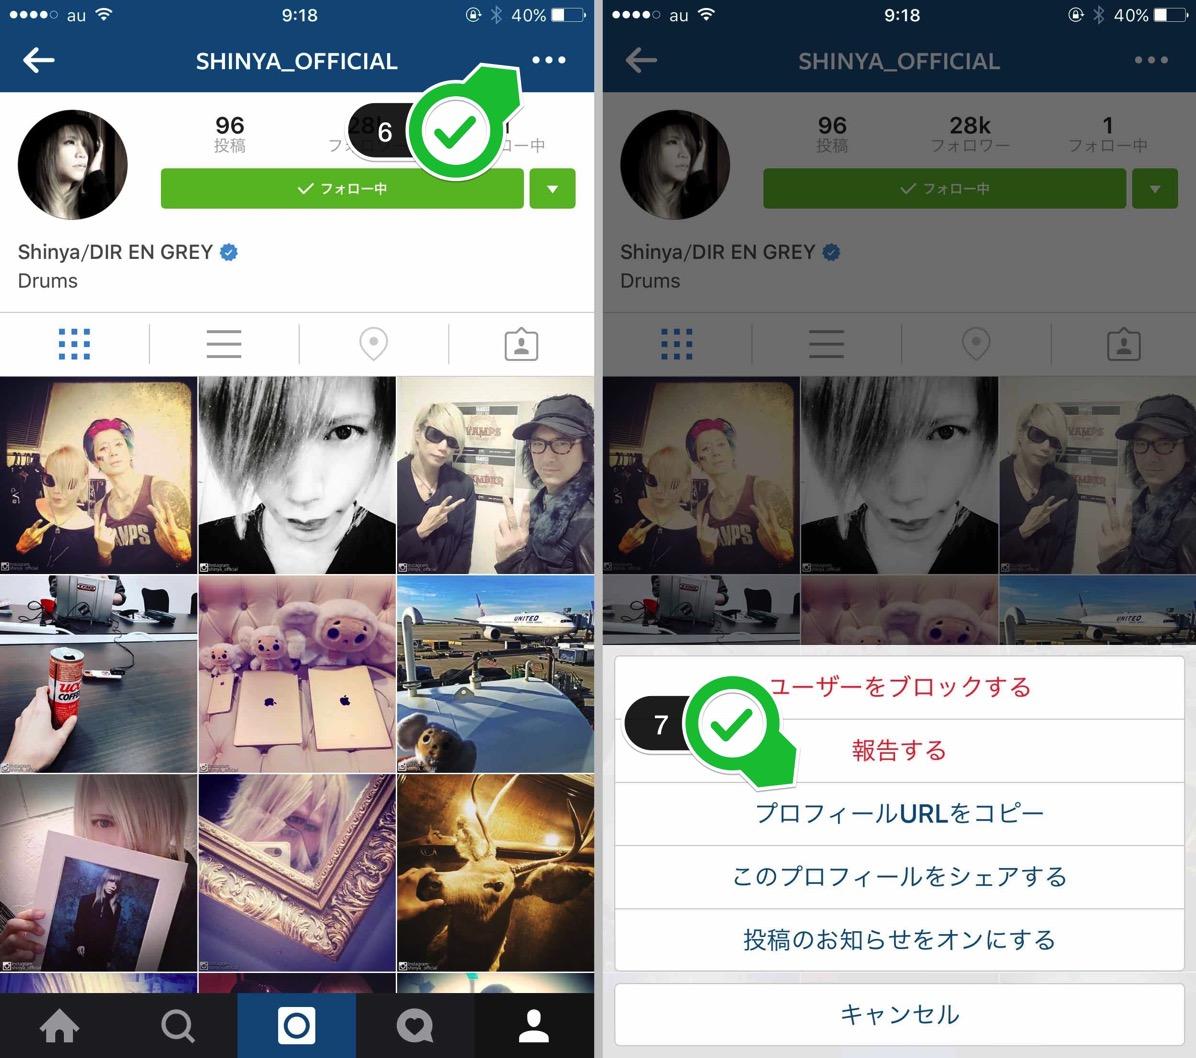 instagramで特定のアカウントが投稿した画像を自動保存する方法【IF】